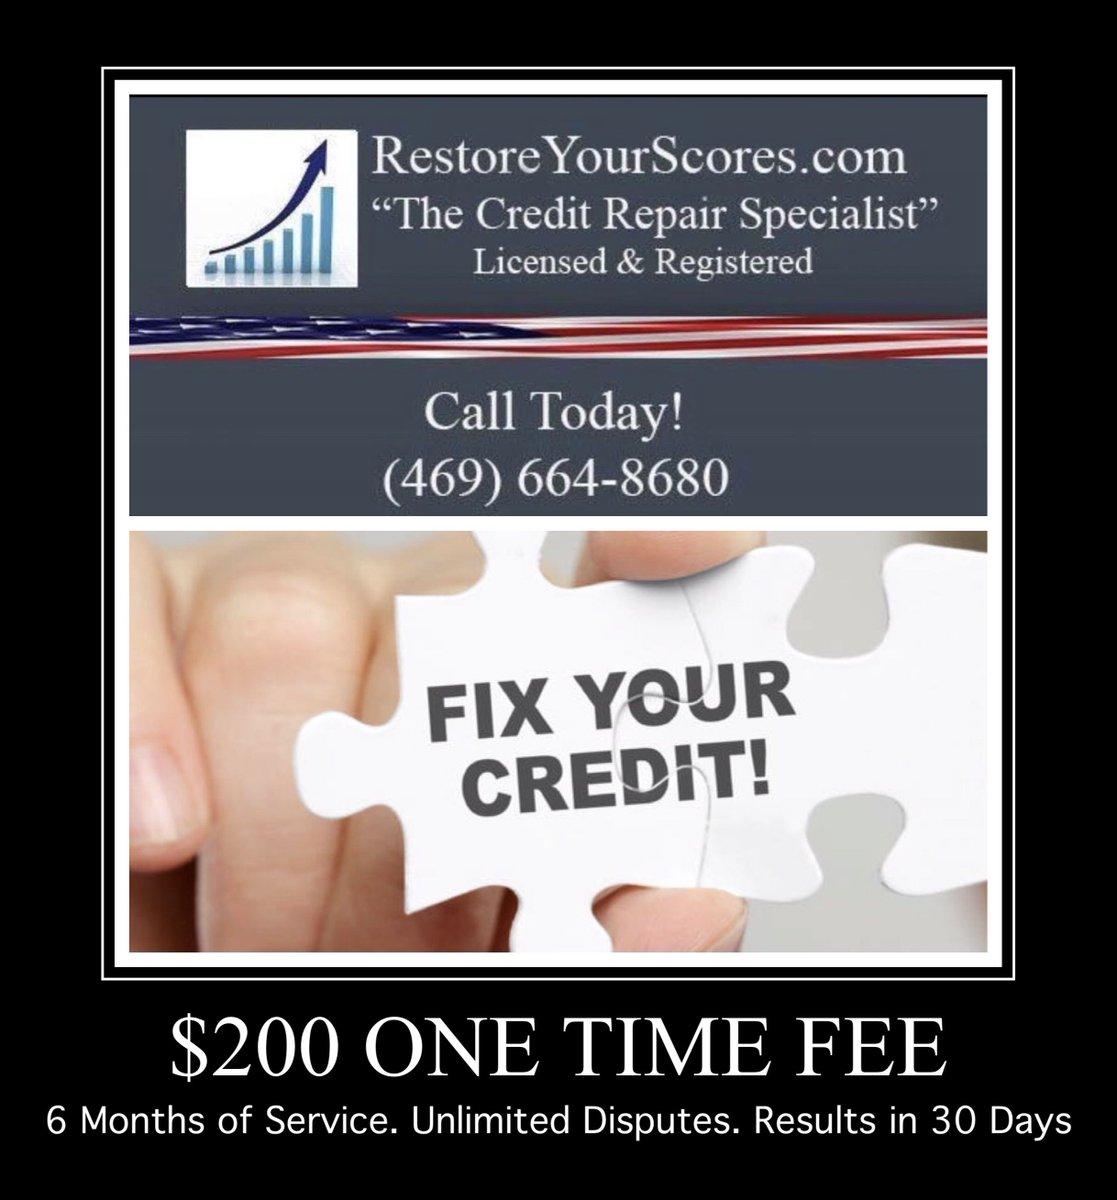 Call today!   #creditrepair #credit #creditrestoration #creditscore #creditrepairservices #tradelines #goodcredit #financialfreedom #money #badcreditpic.twitter.com/3w3KODYUKM